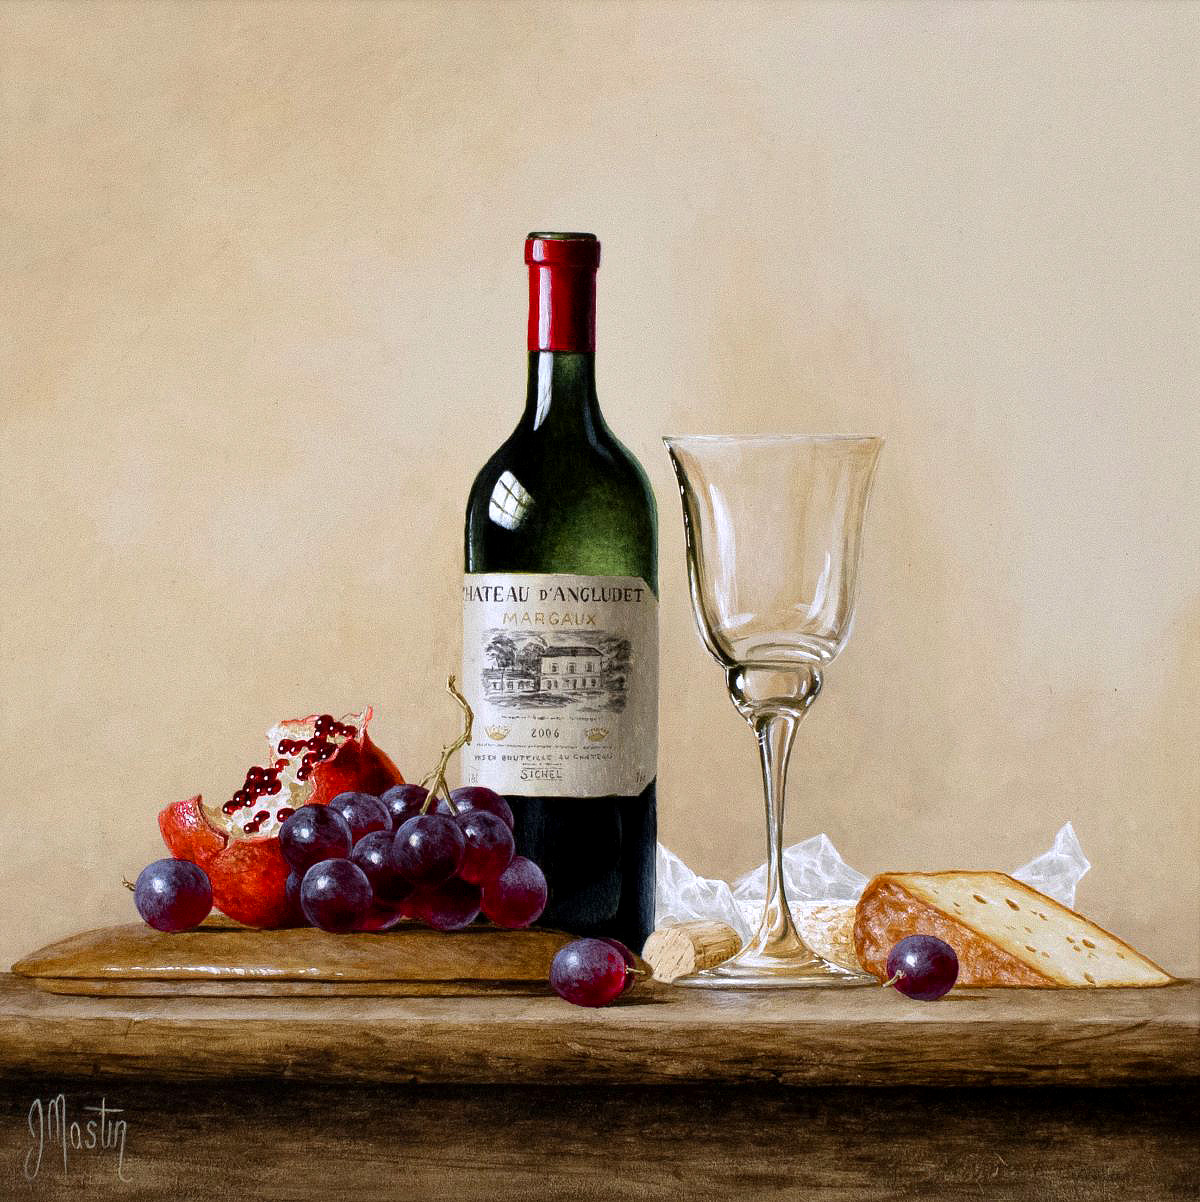 Ian Mastin, 'Chateau d'Angluet Margaux', acrylic on board